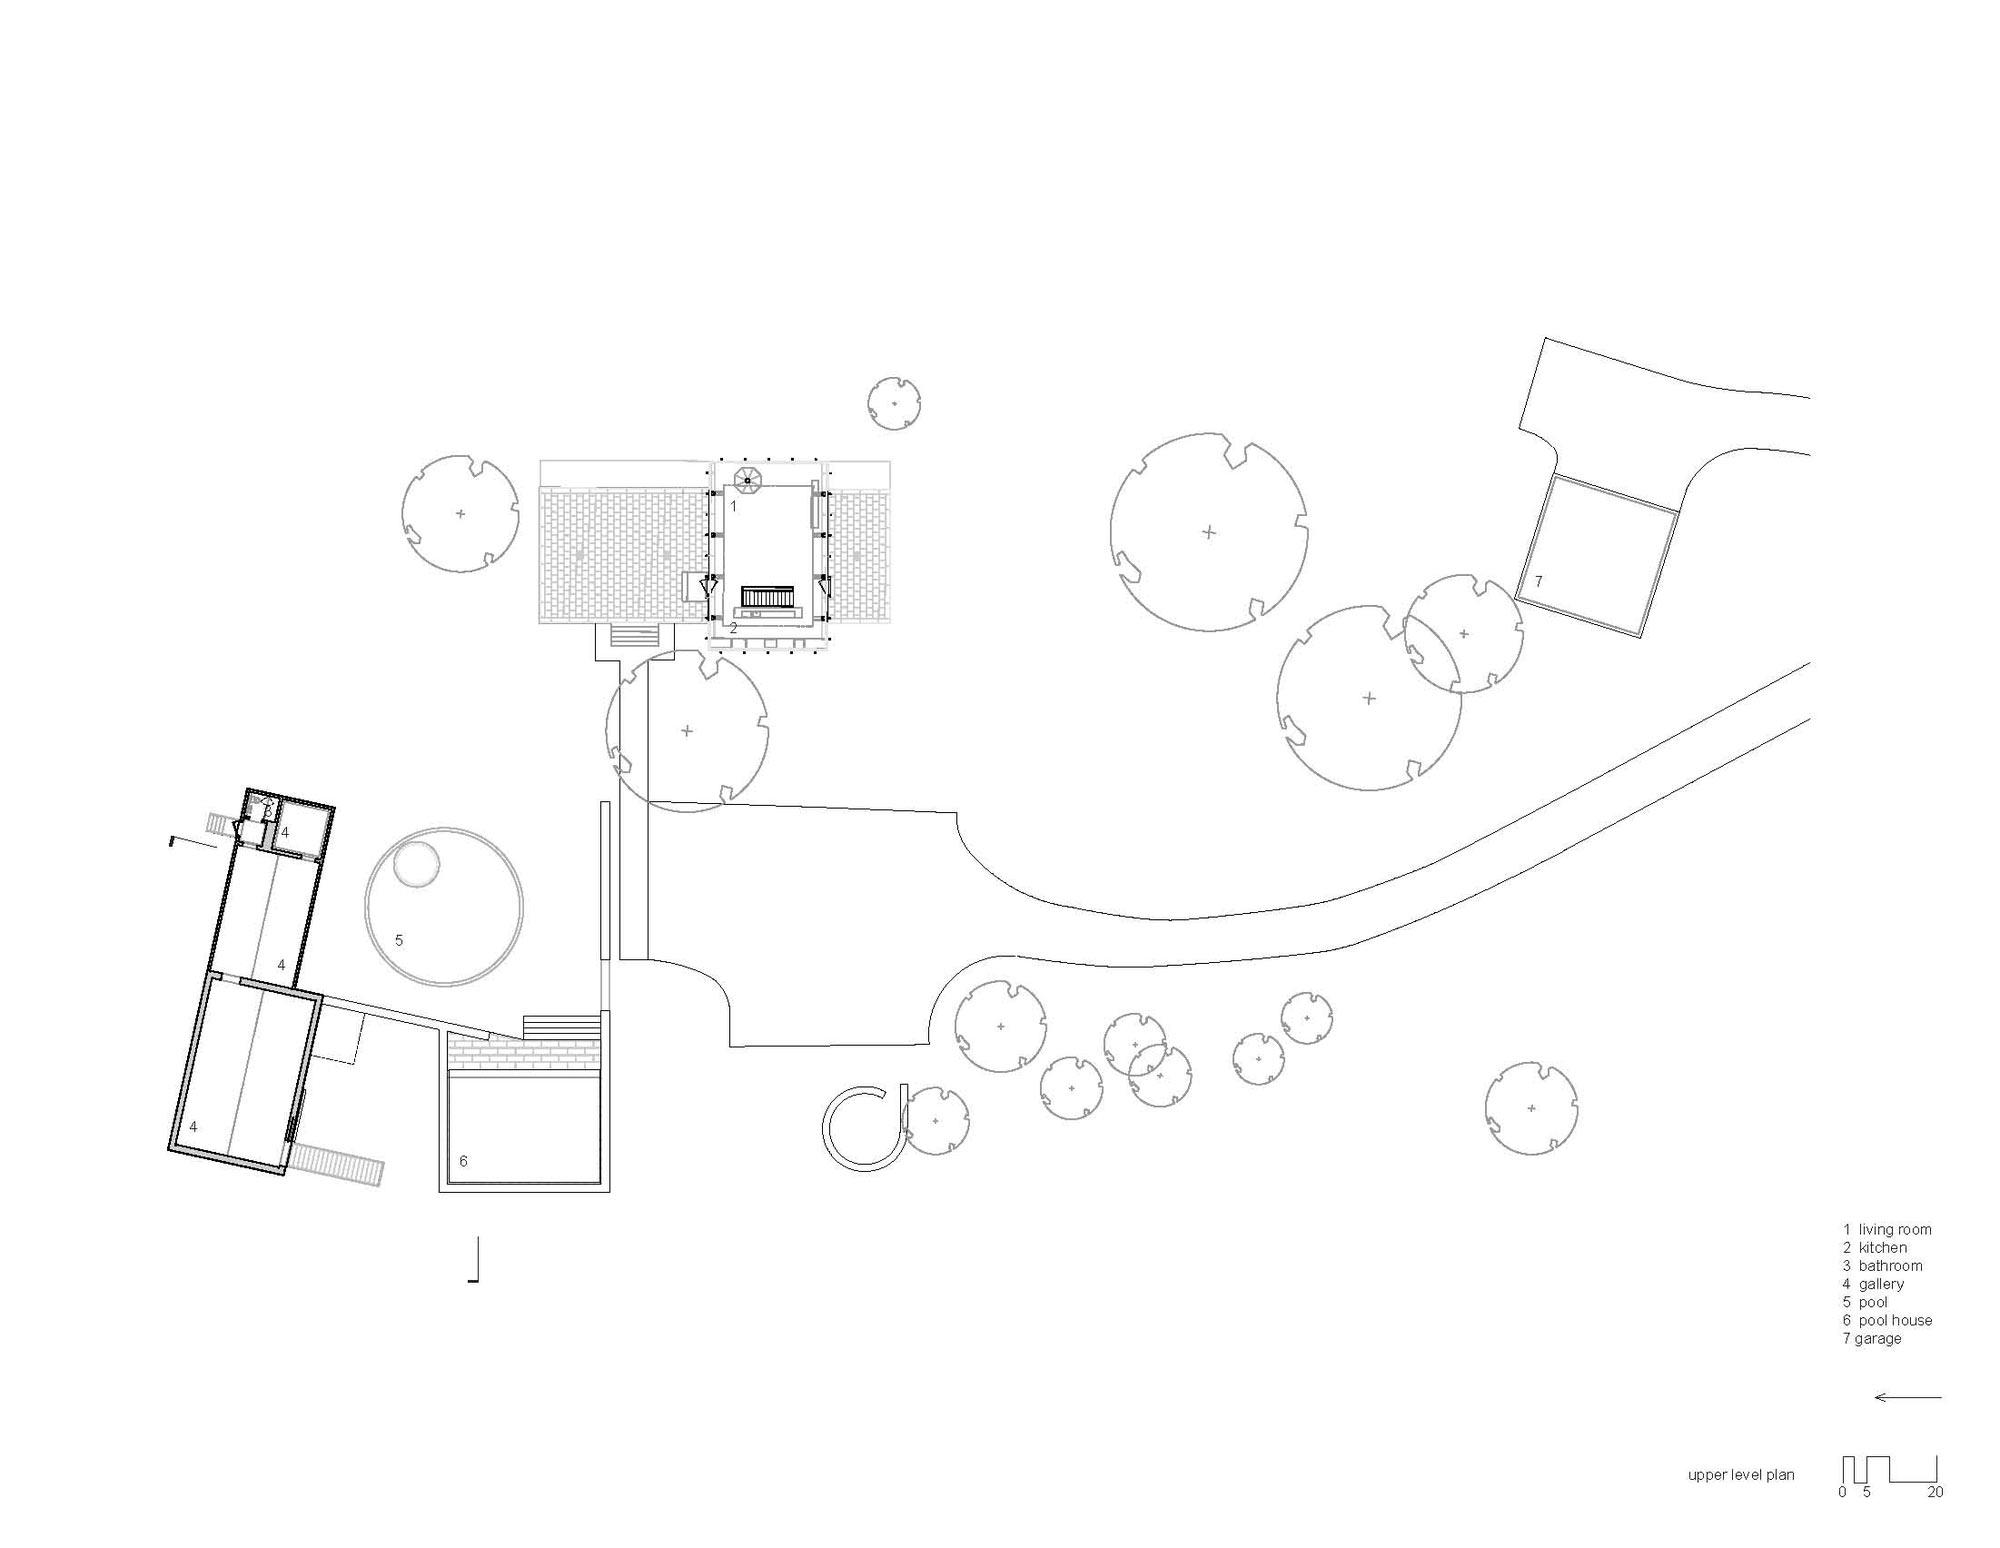 Upper Level PlanArt Gallery, Robert C. Wiley House Originally Designed by Philip Johnson